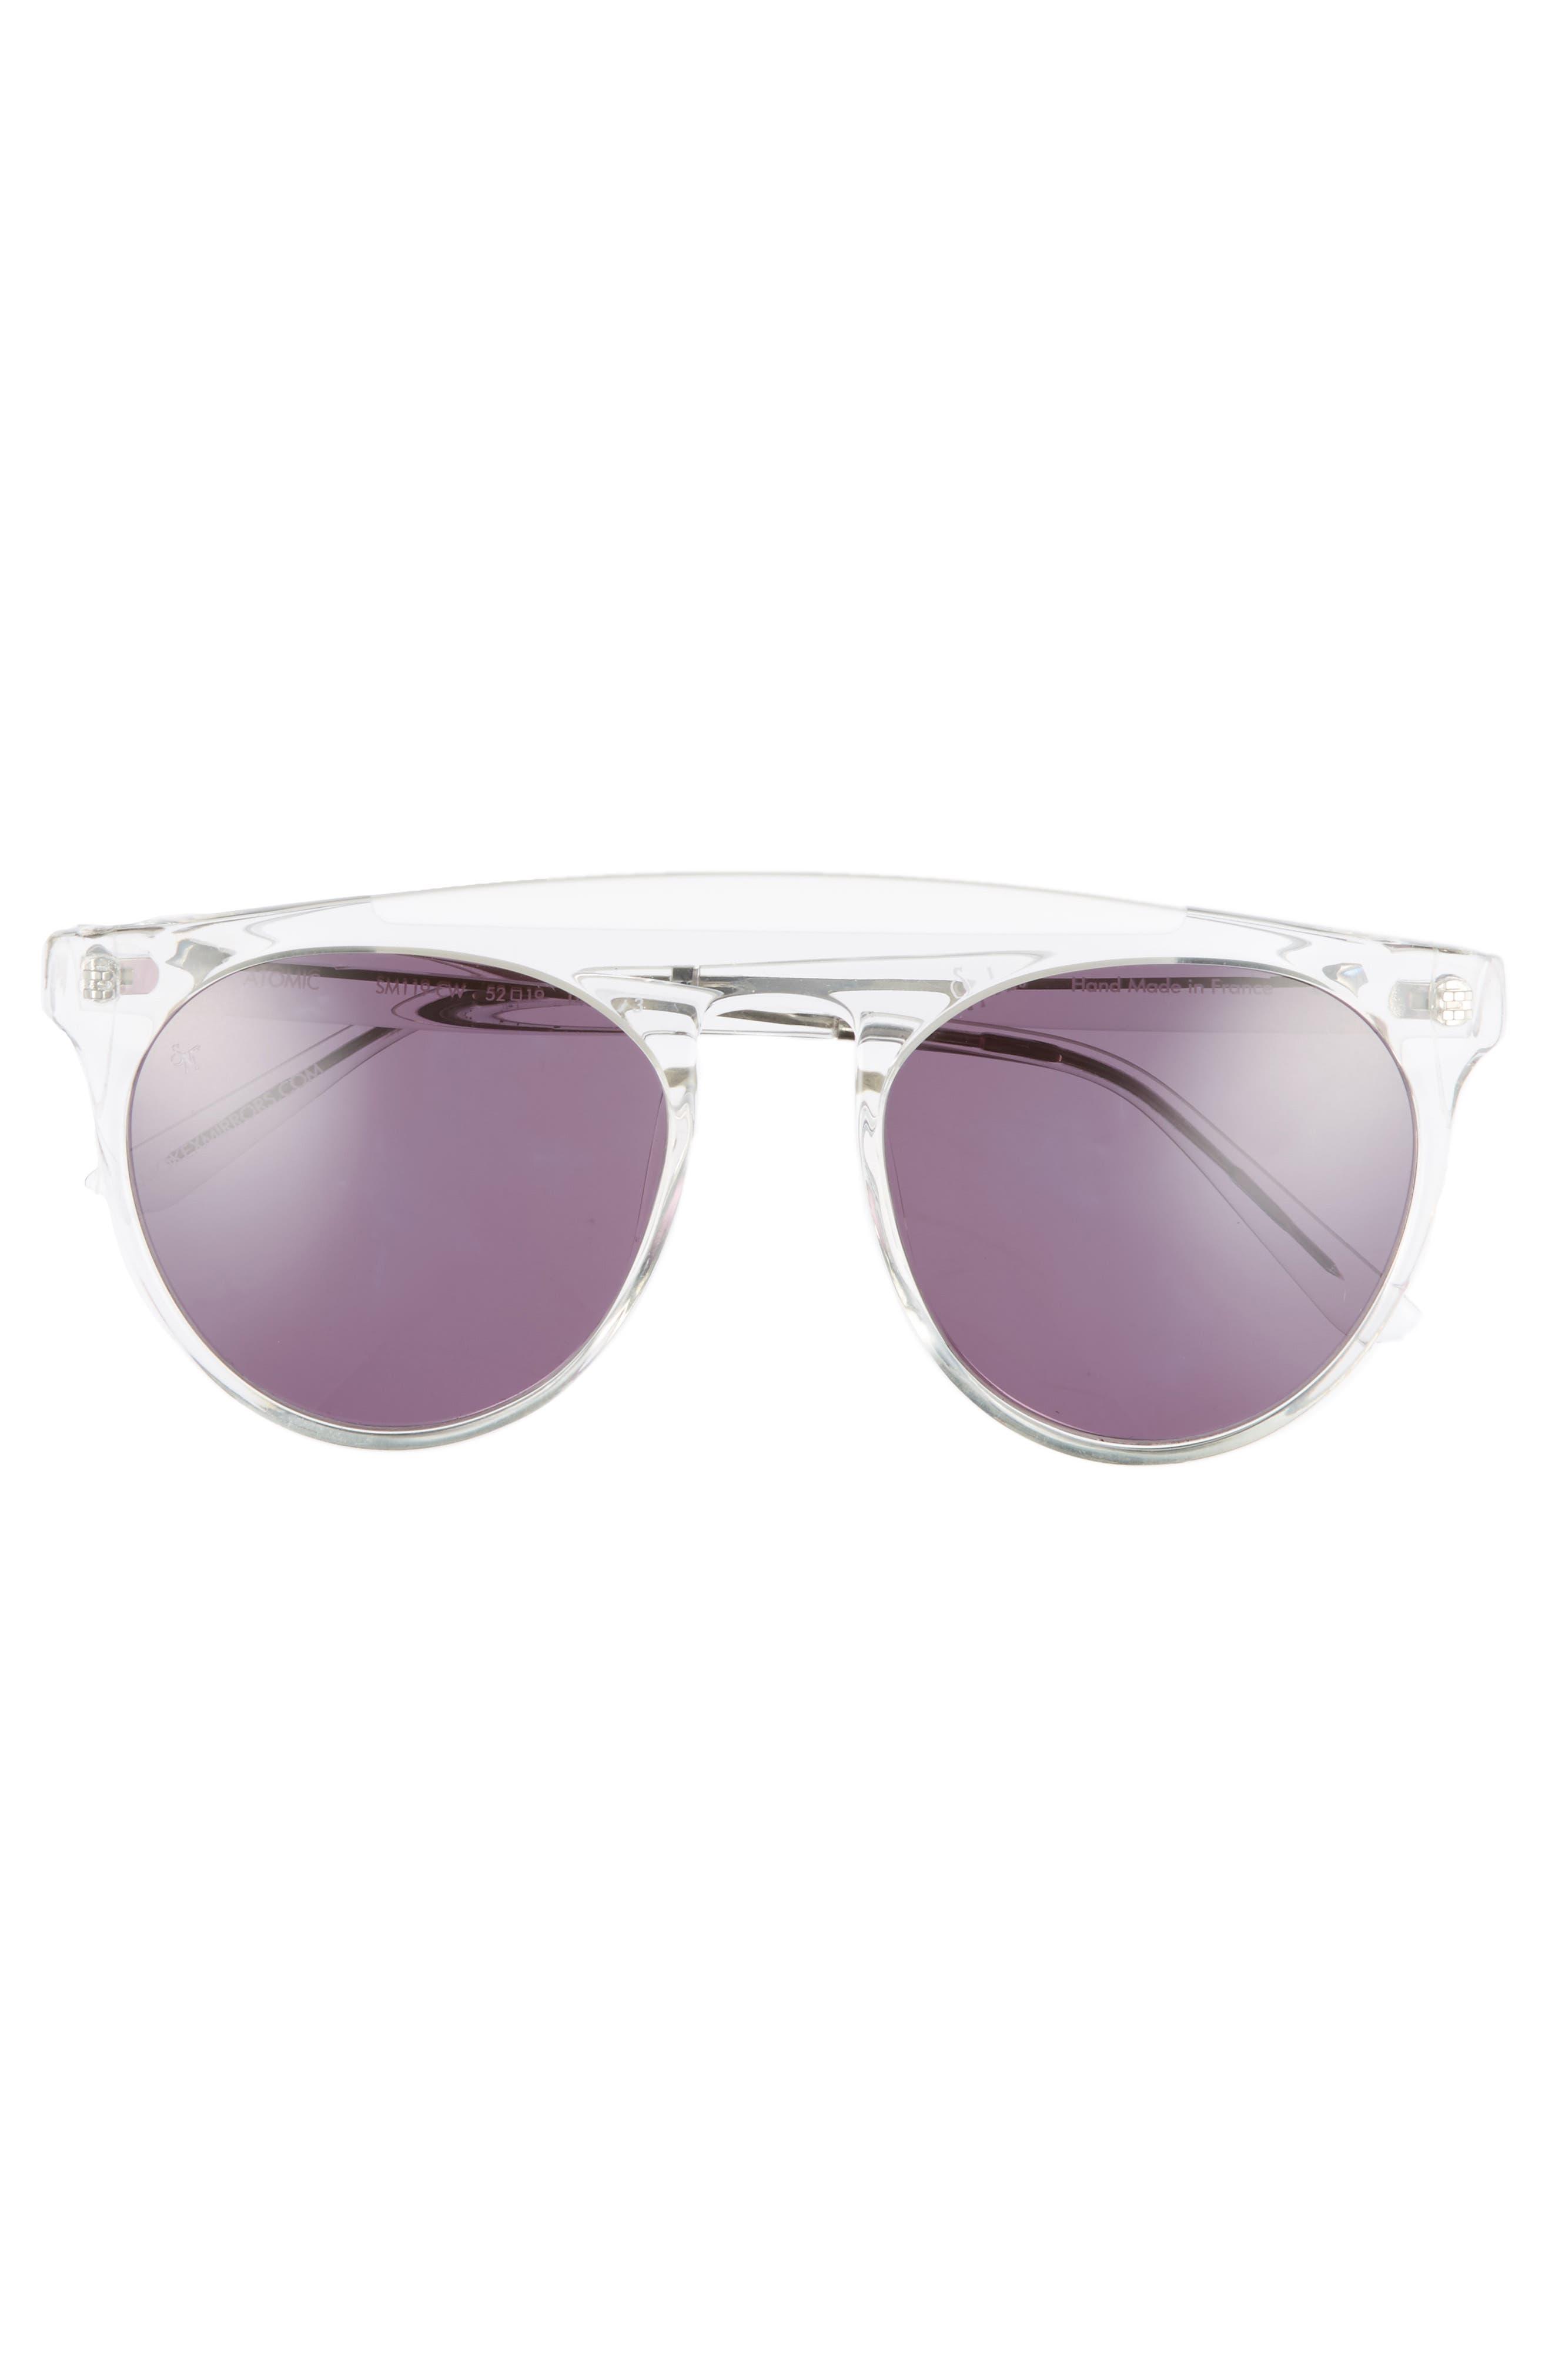 Atomic 52mm Sunglasses,                             Alternate thumbnail 4, color,